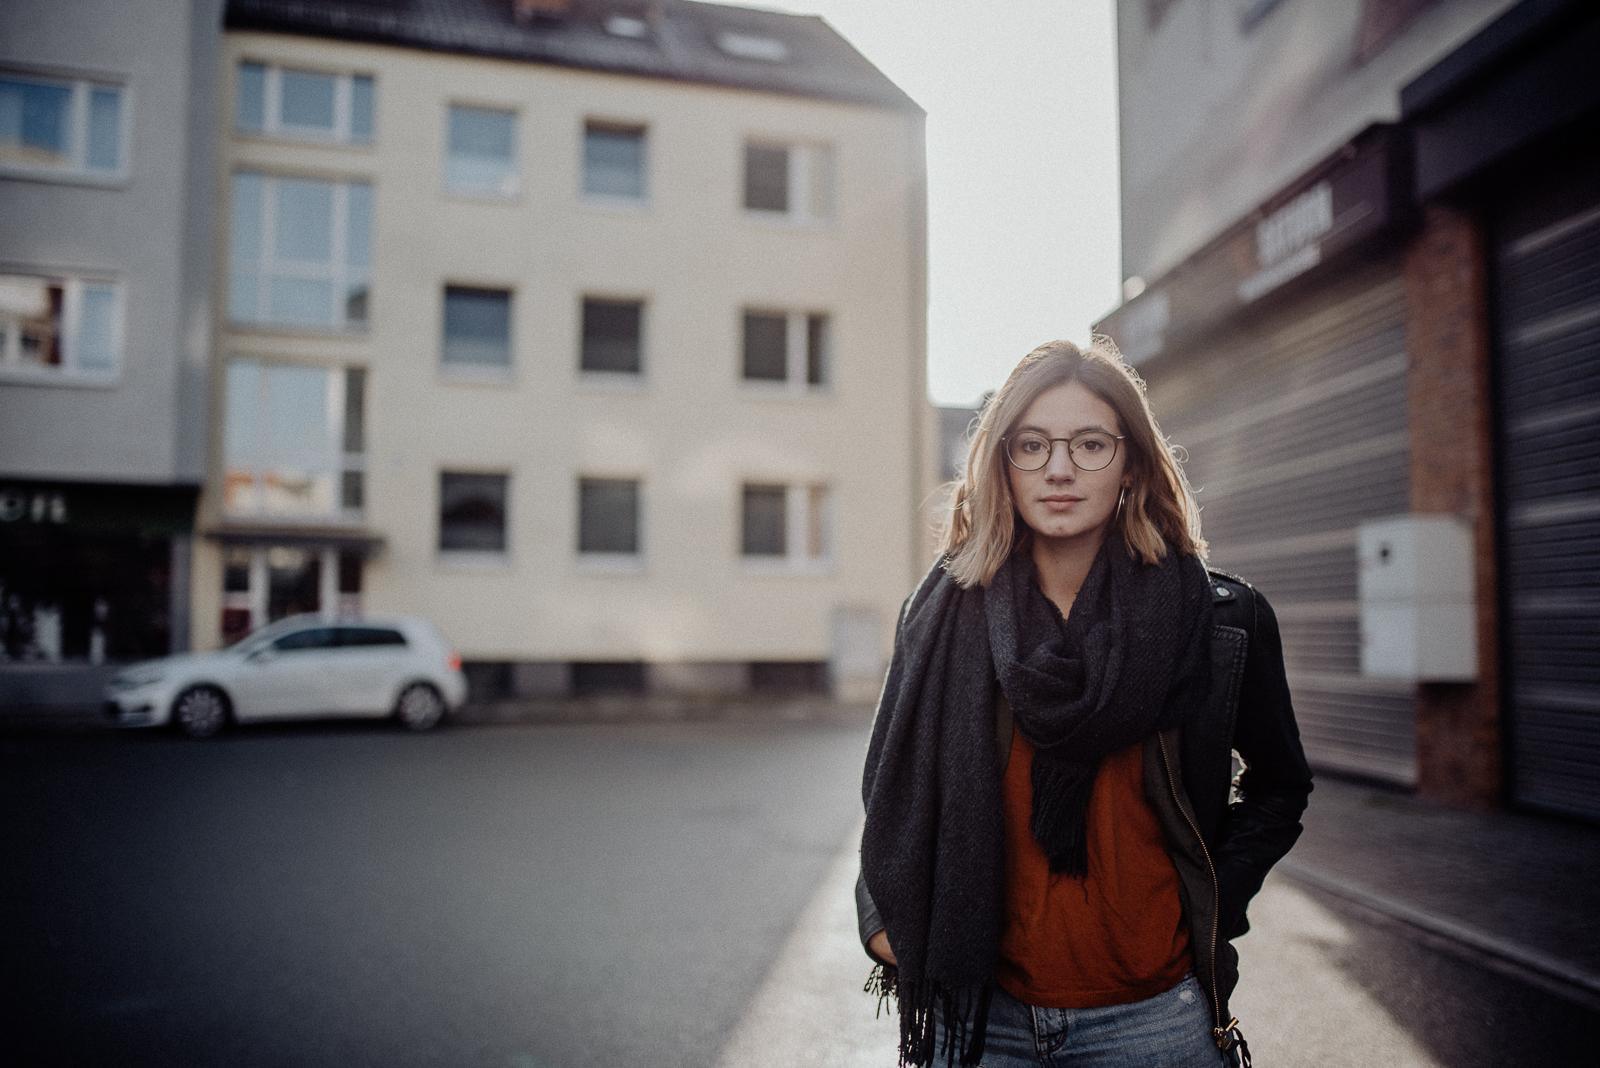 001-designparaplus-fotografin-witten-portrait-shooting-downtown-3